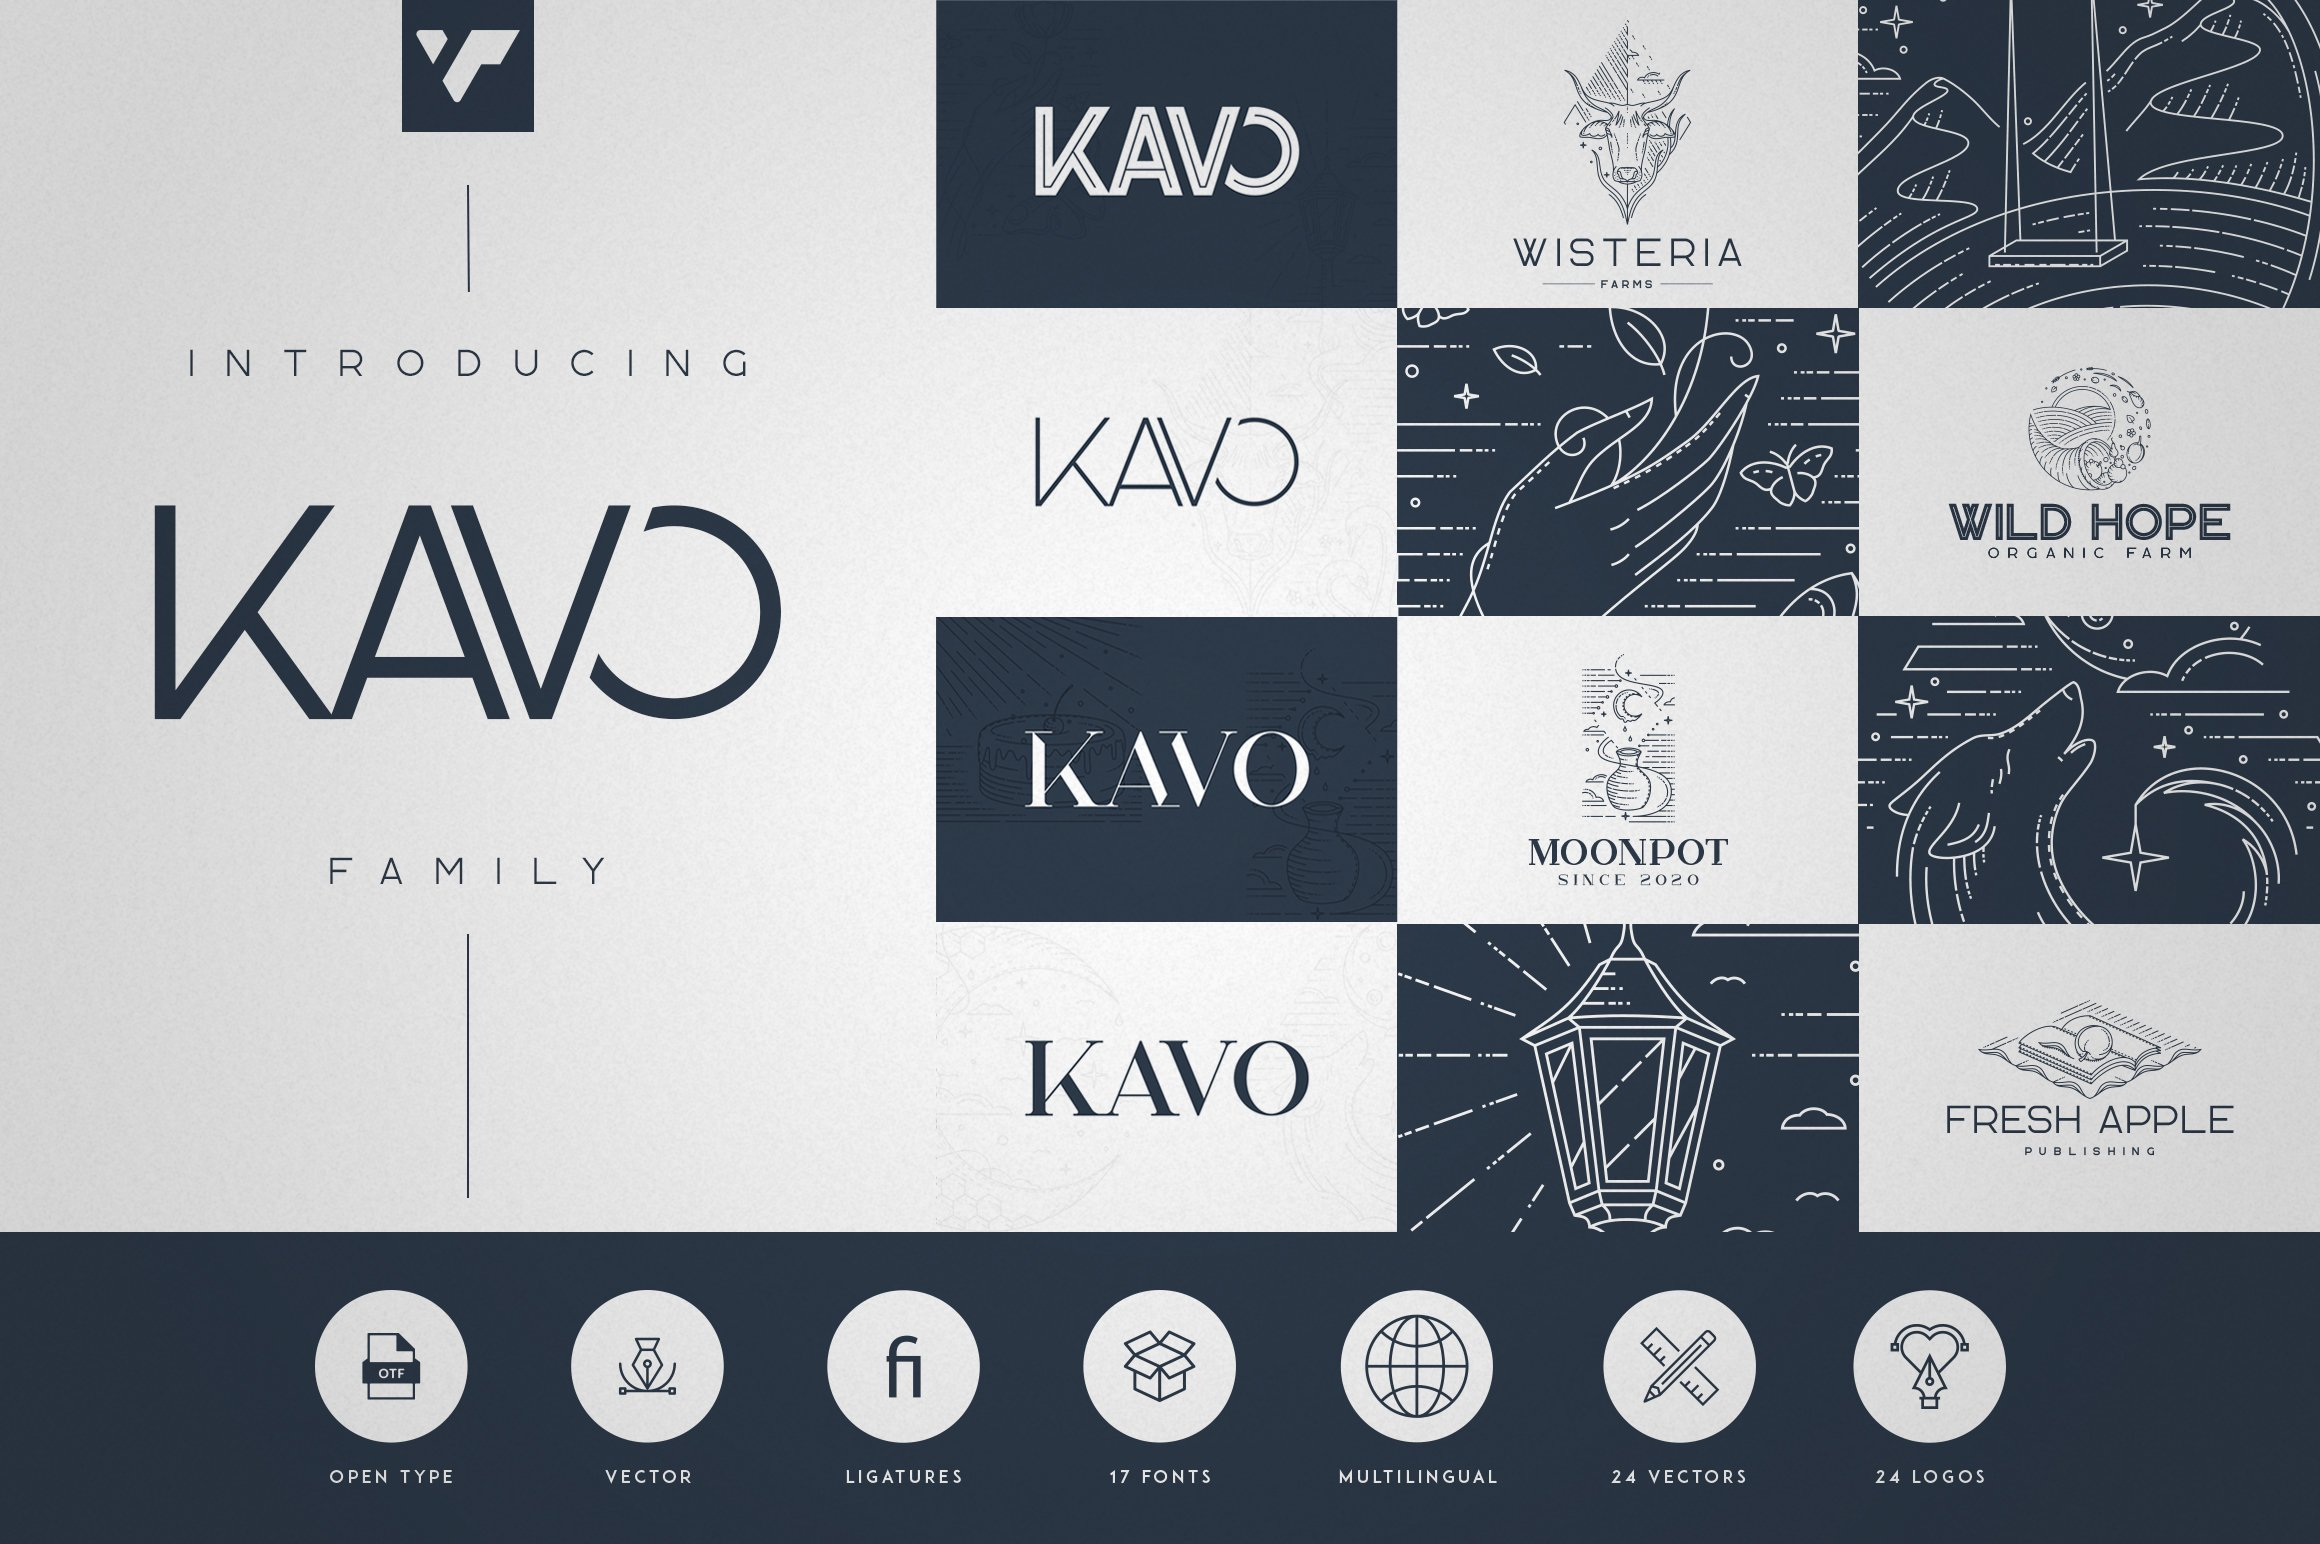 Kavo Family - 17 fonts 24 logos example image 1